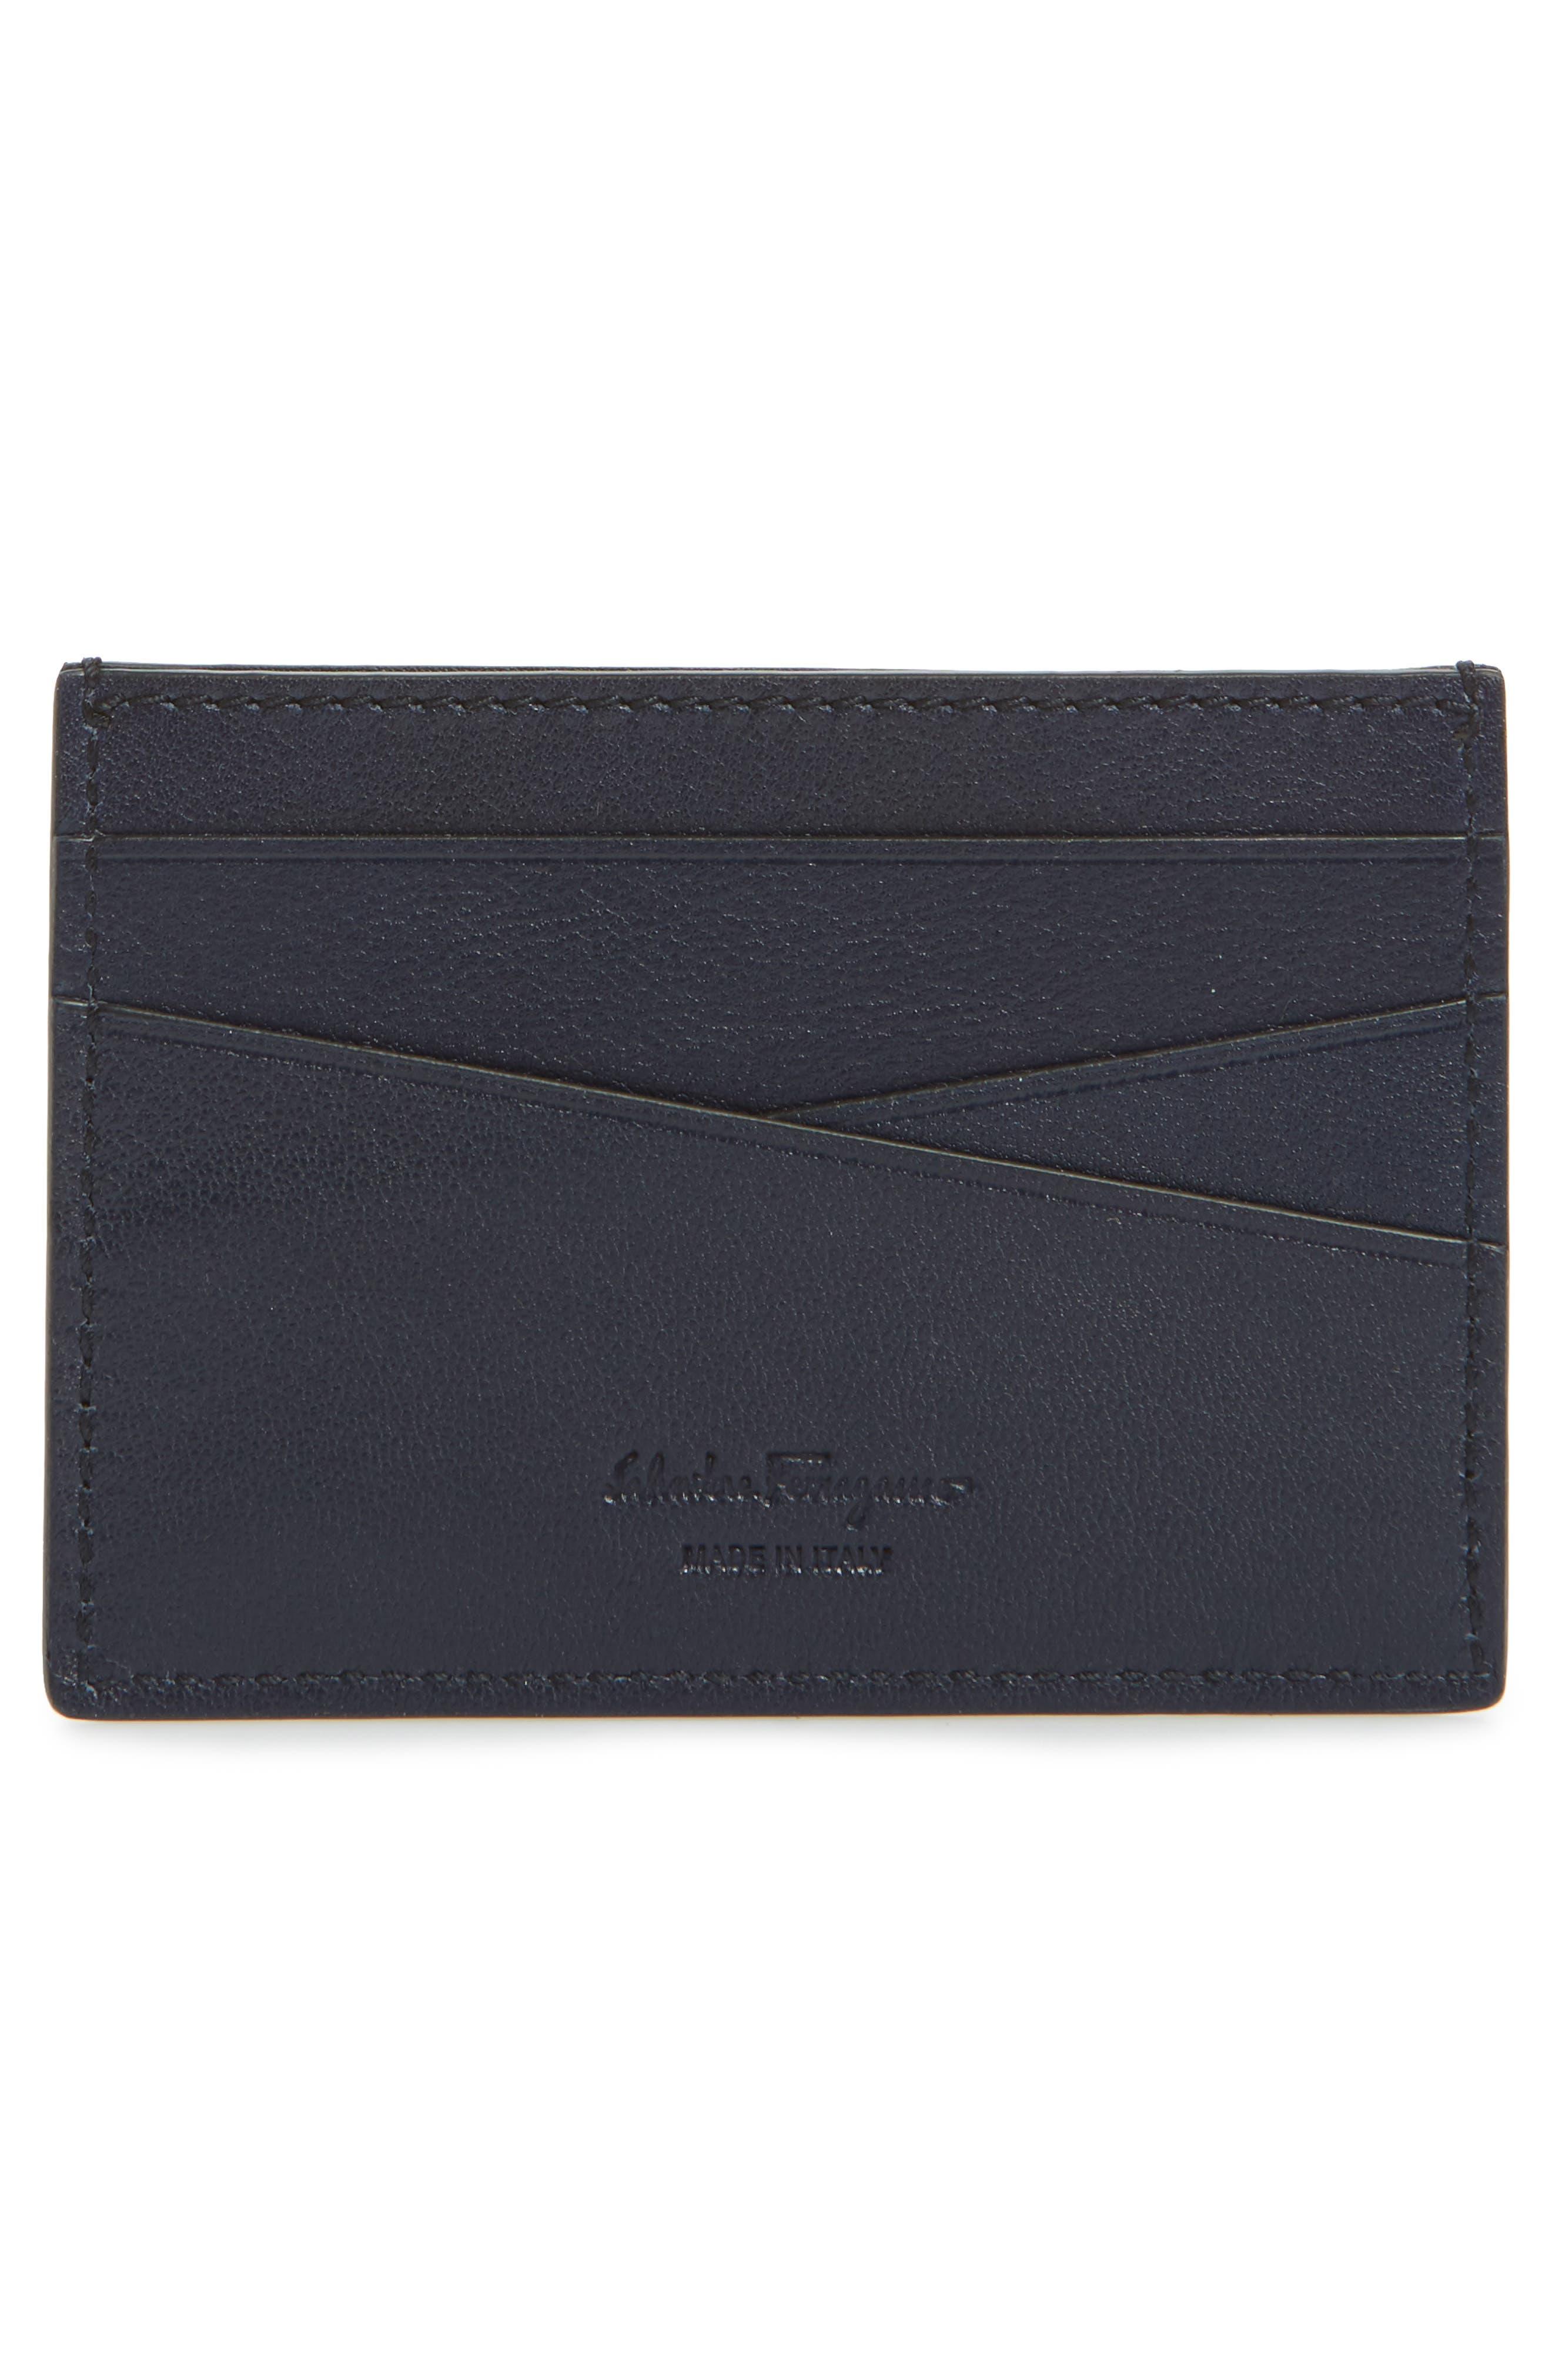 Revival Leather Card Case,                             Alternate thumbnail 2, color,                             Blue